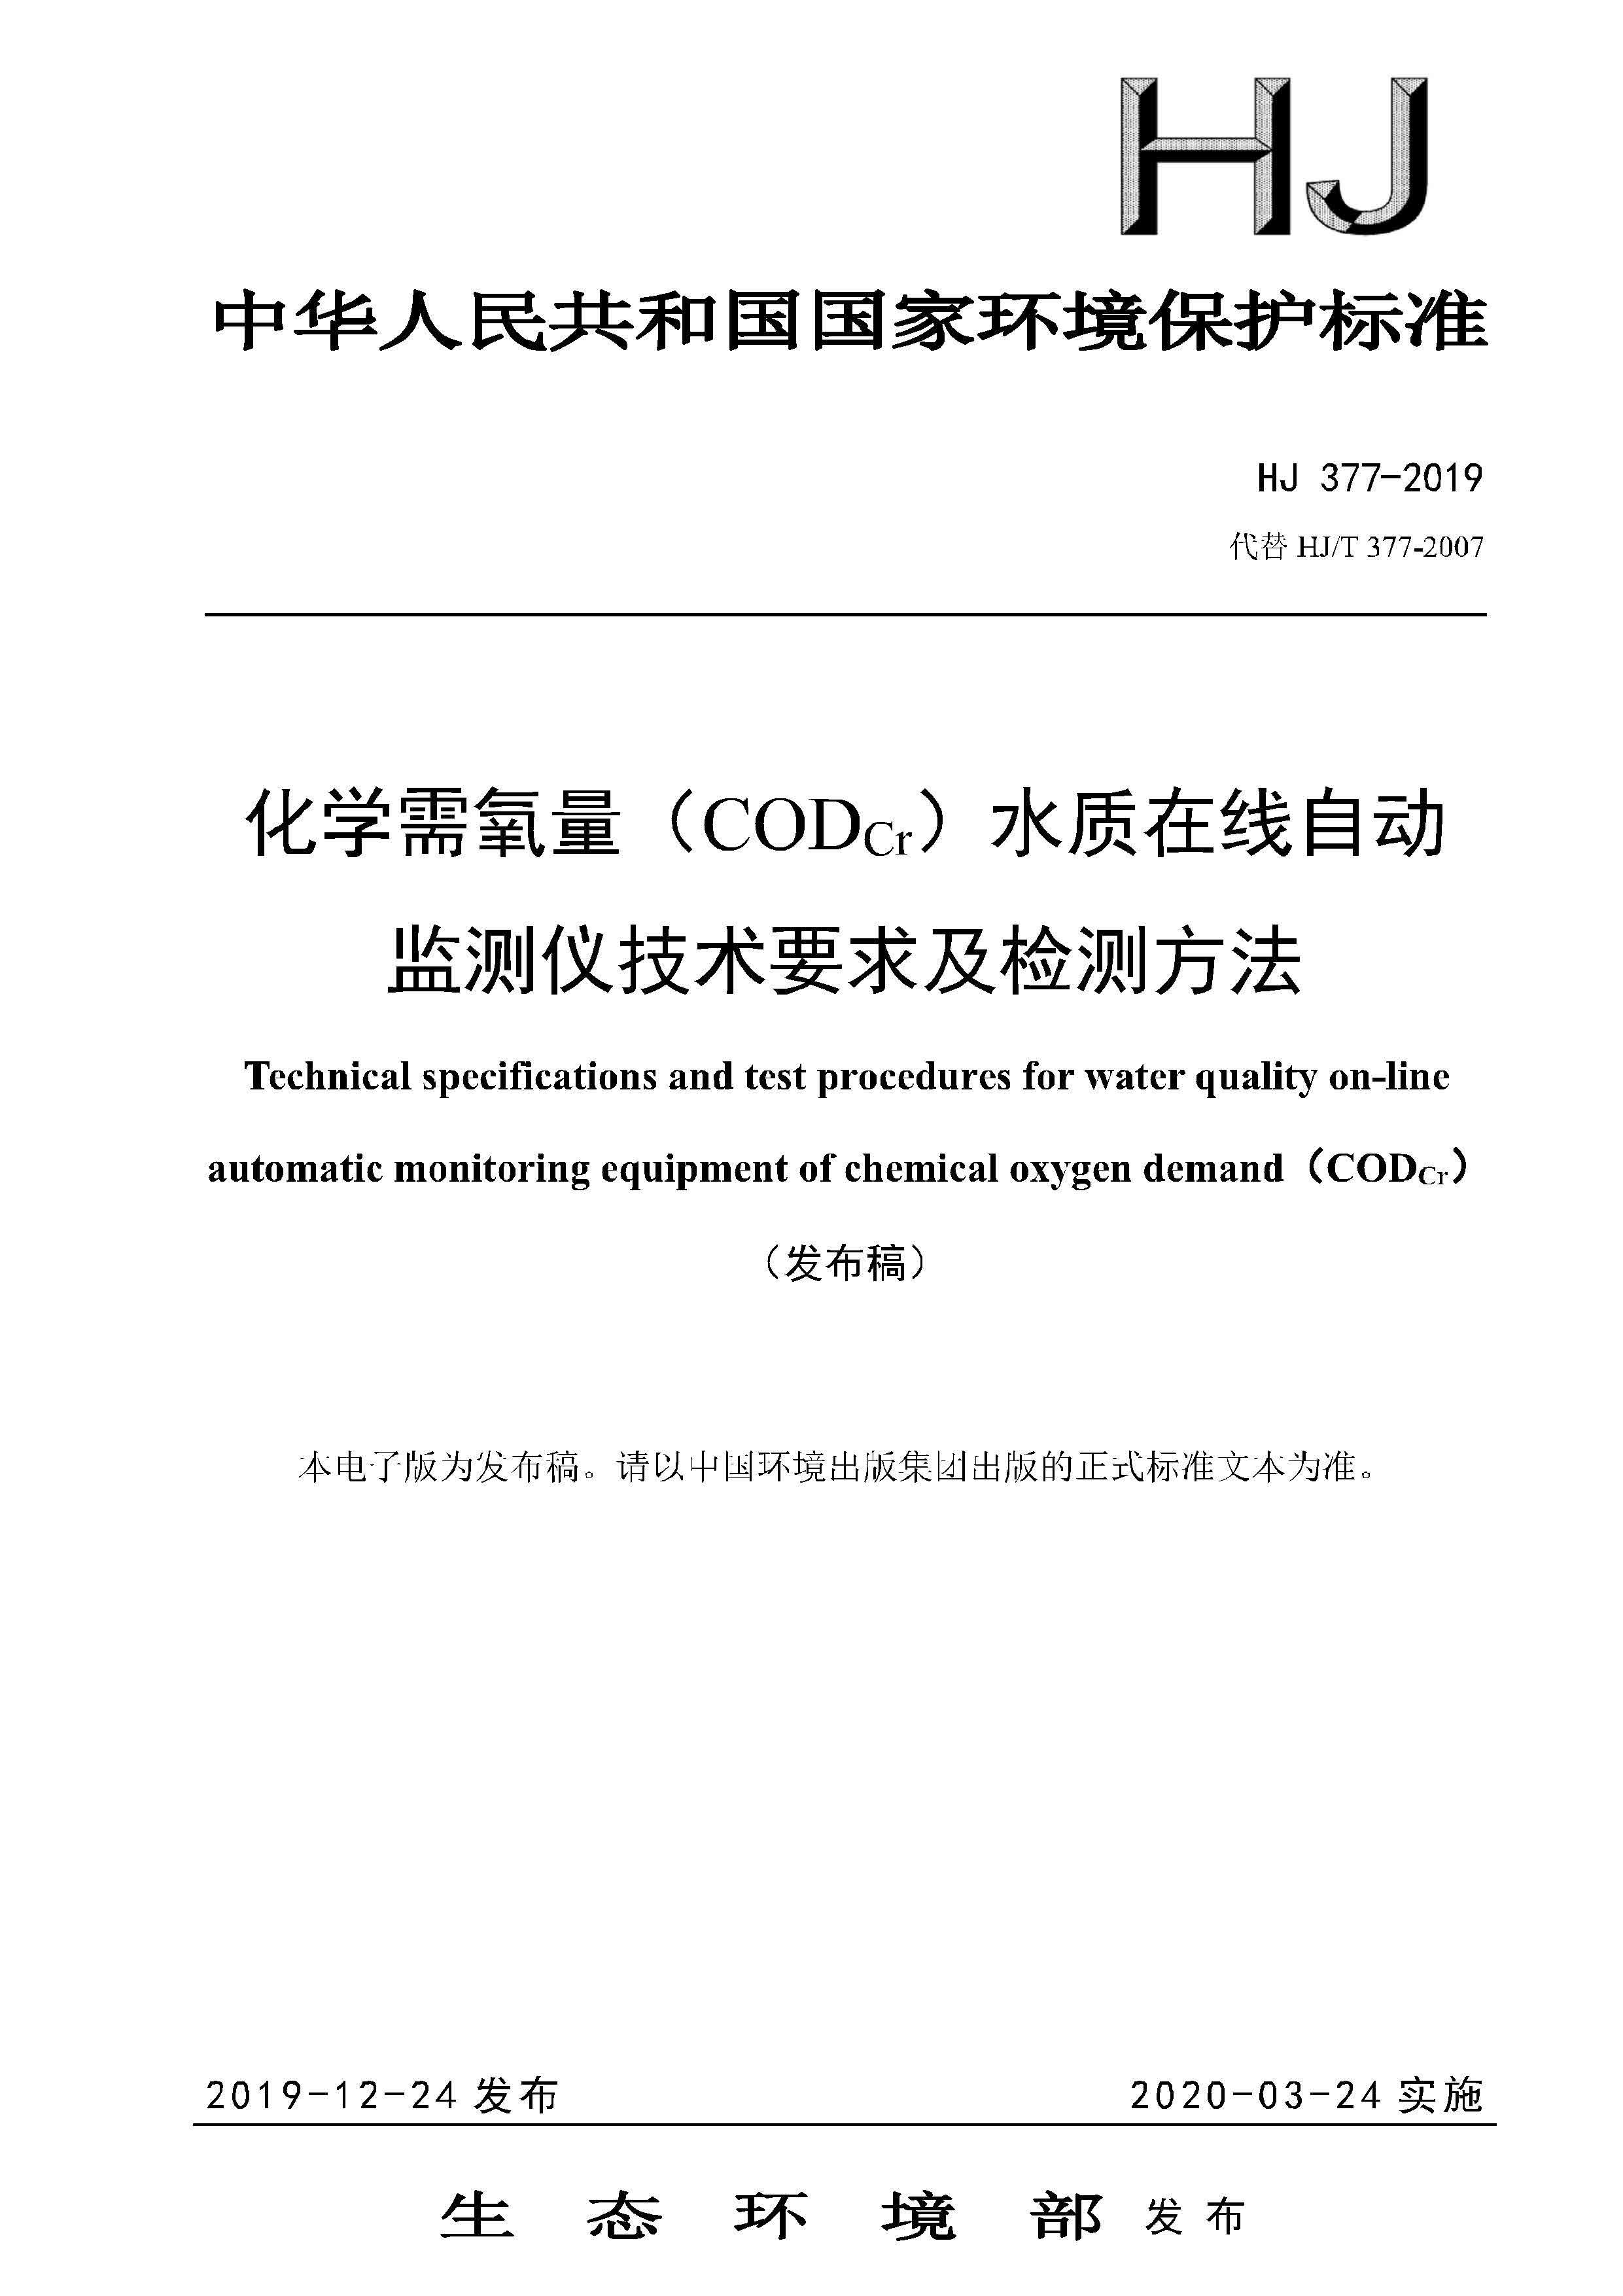 HJ 377-2019 化学需氧量(CODCr)水质在线自动监测仪技术要求及检测方法 可下载)